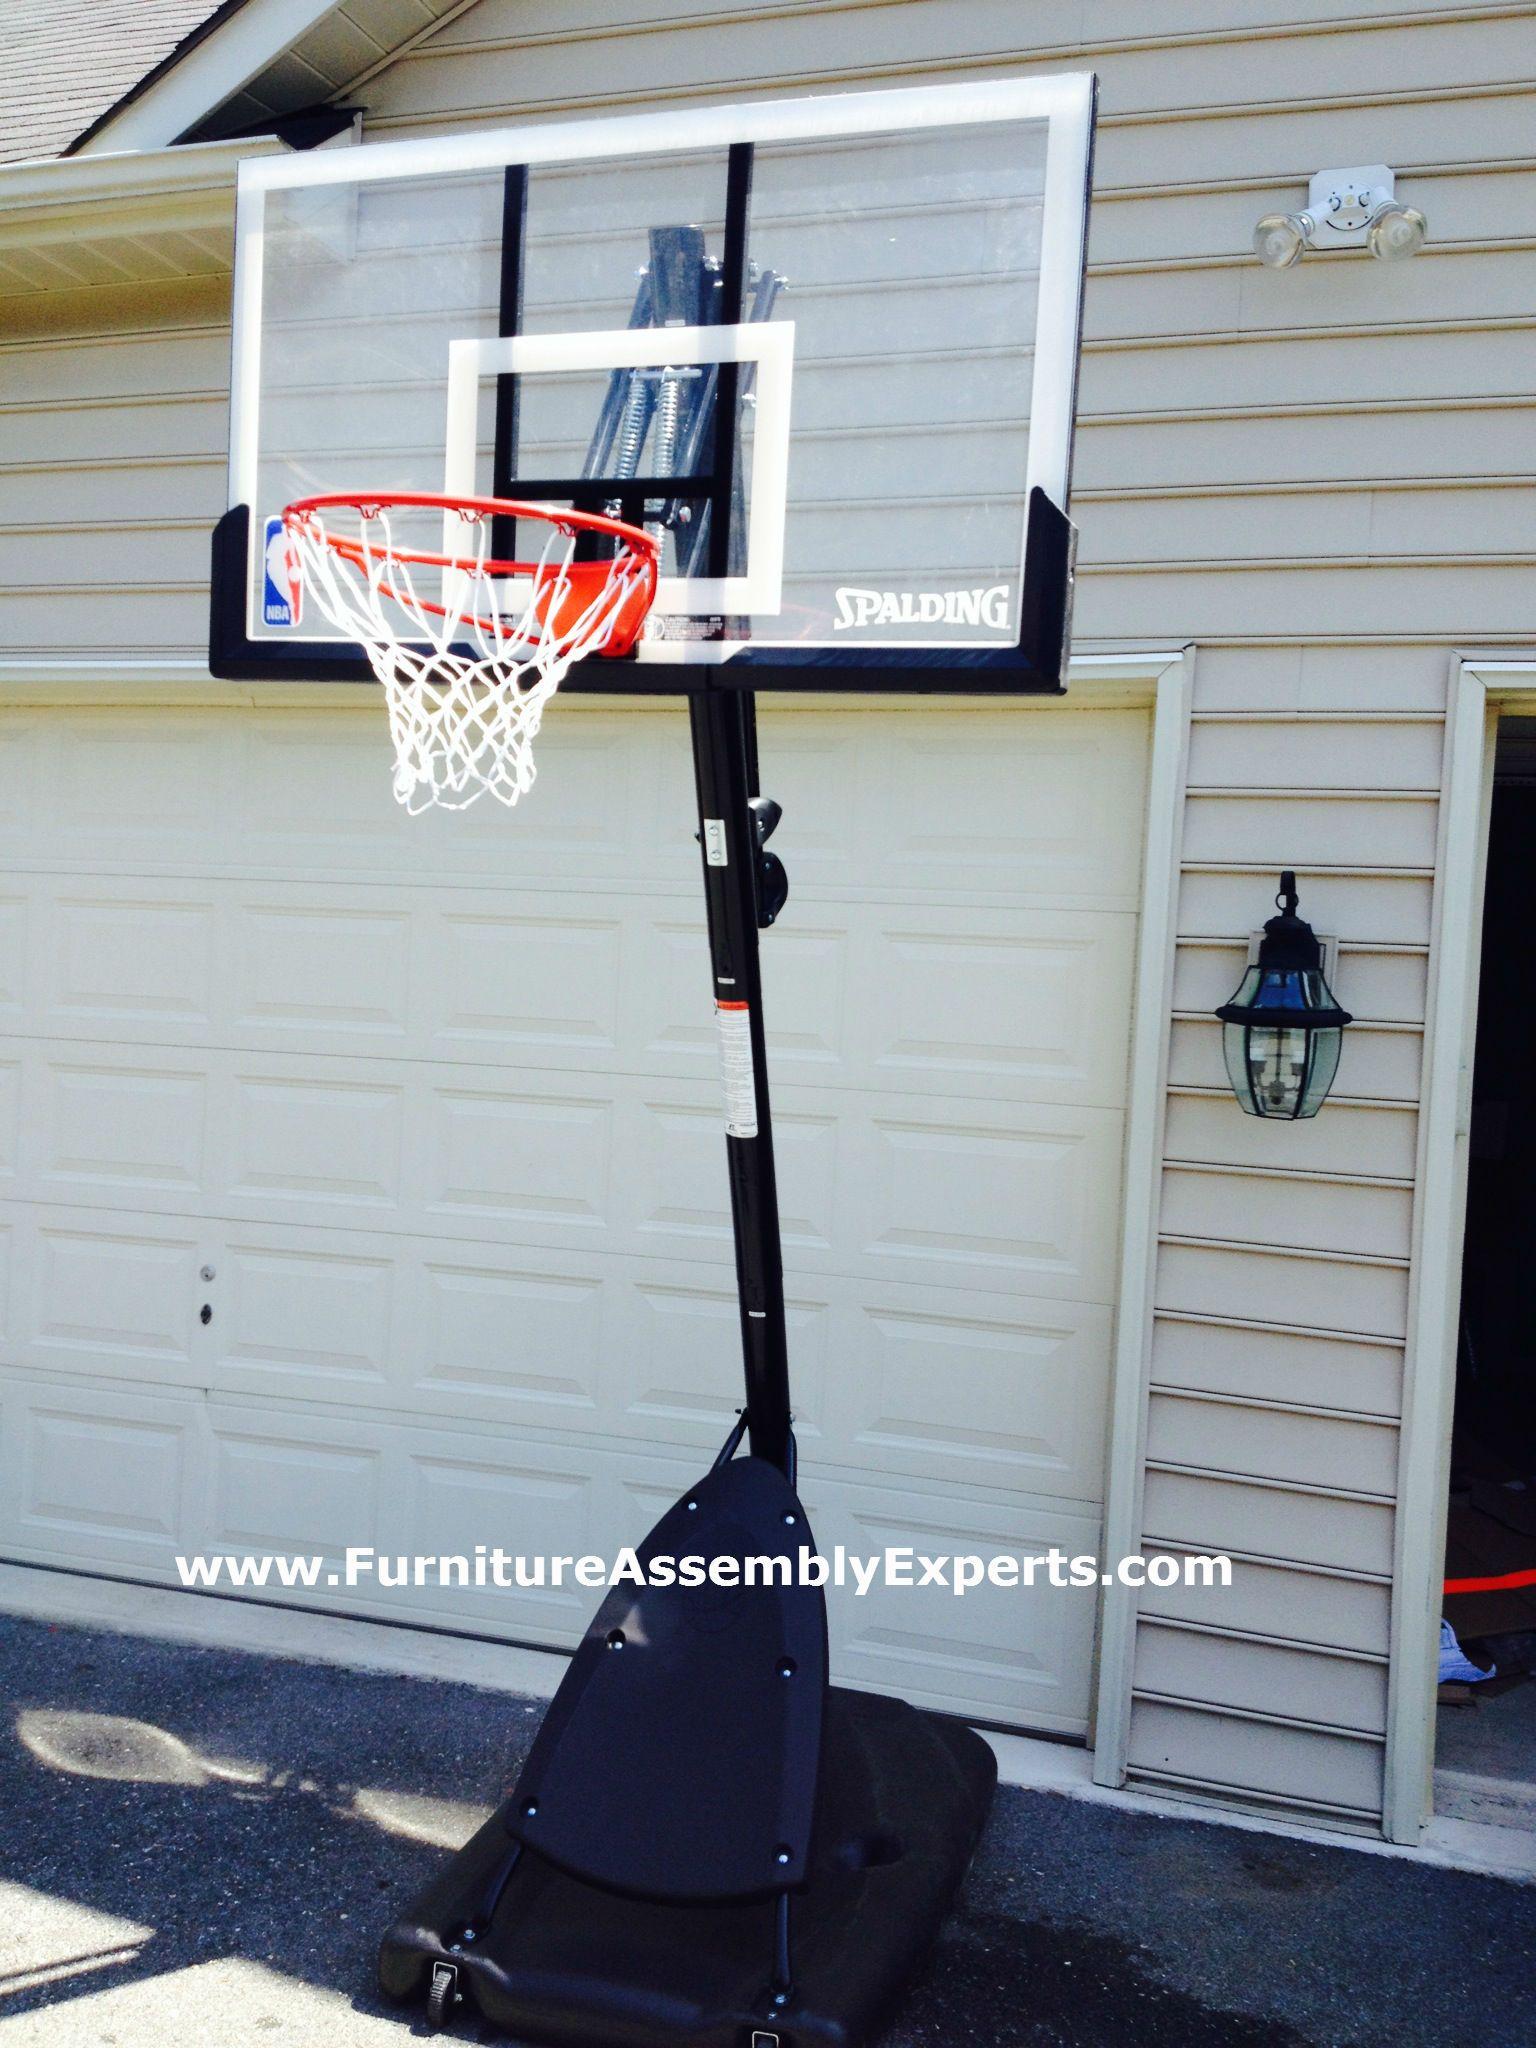 spalding portable basketball hoop system assembled in rockville md